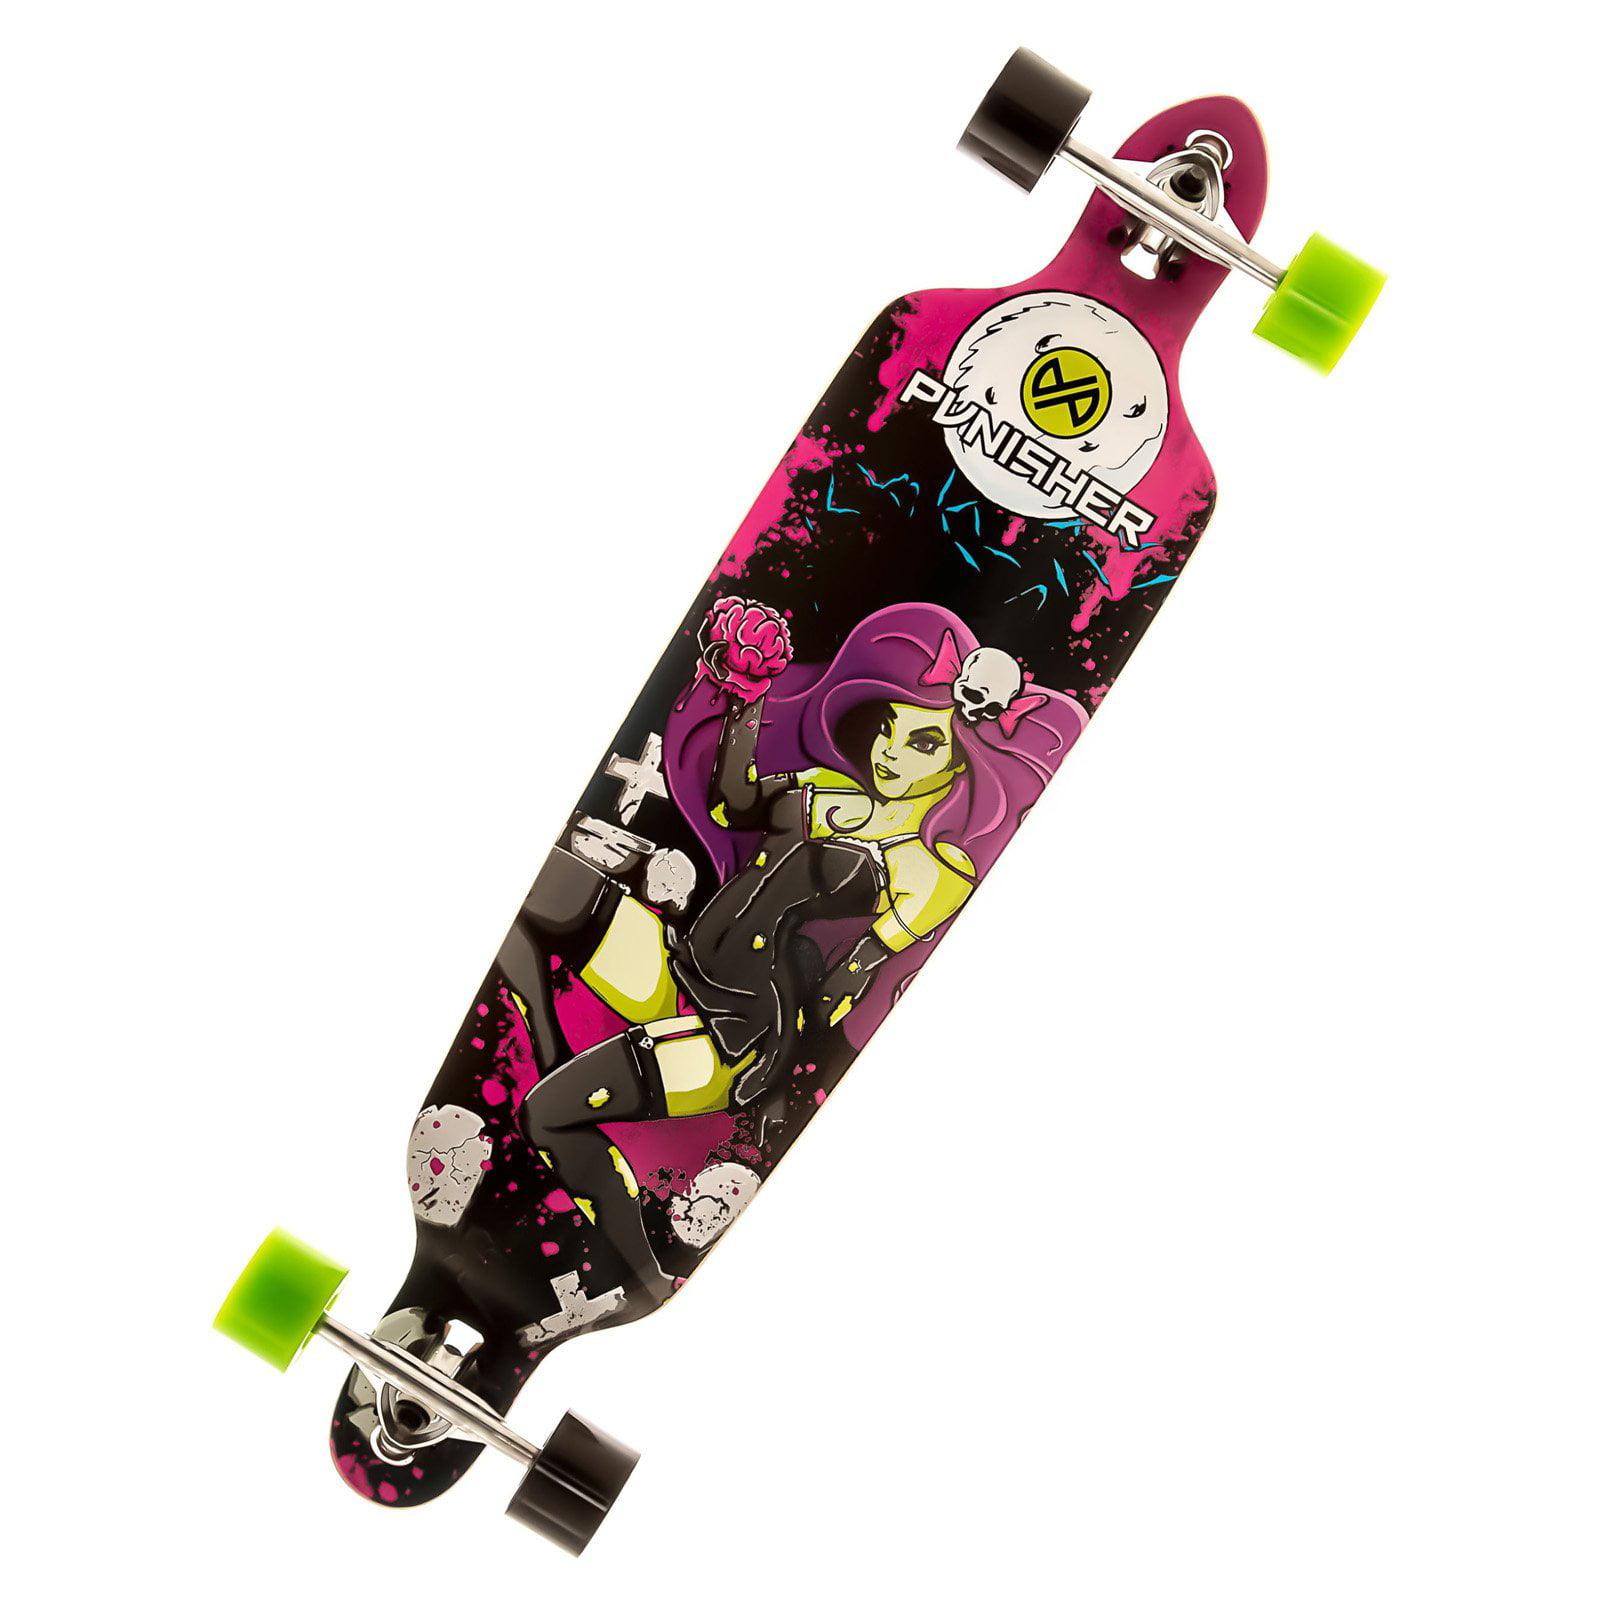 "Punisher Skateboards Zombie 40"" Longboard, Double Kick with Drop Down Deck"